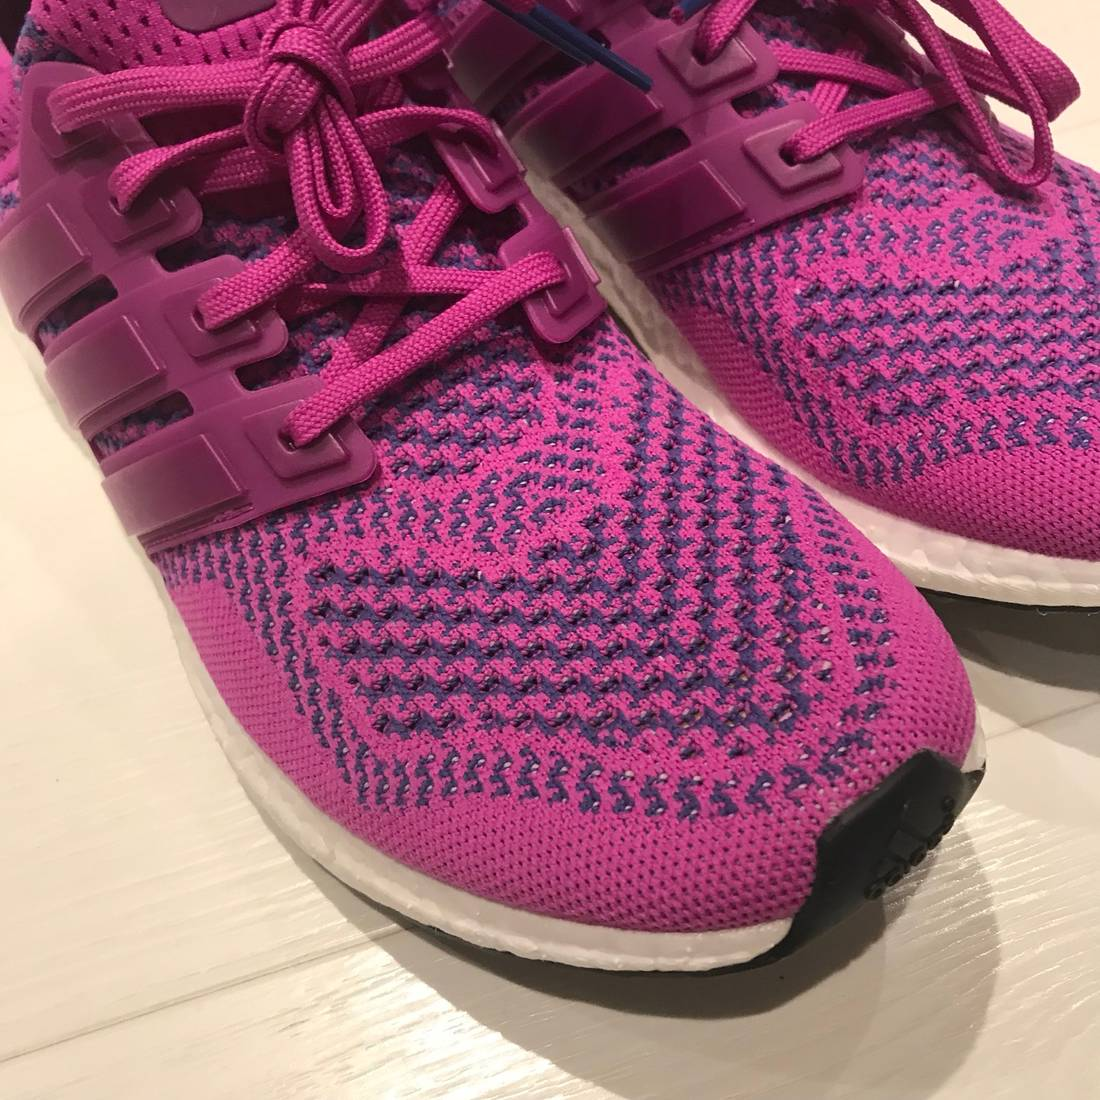 feba0f2c3 ... promo code for adidas adidas ultraboost 1.0 flash pink size us 10 eu 43  1 e70e0